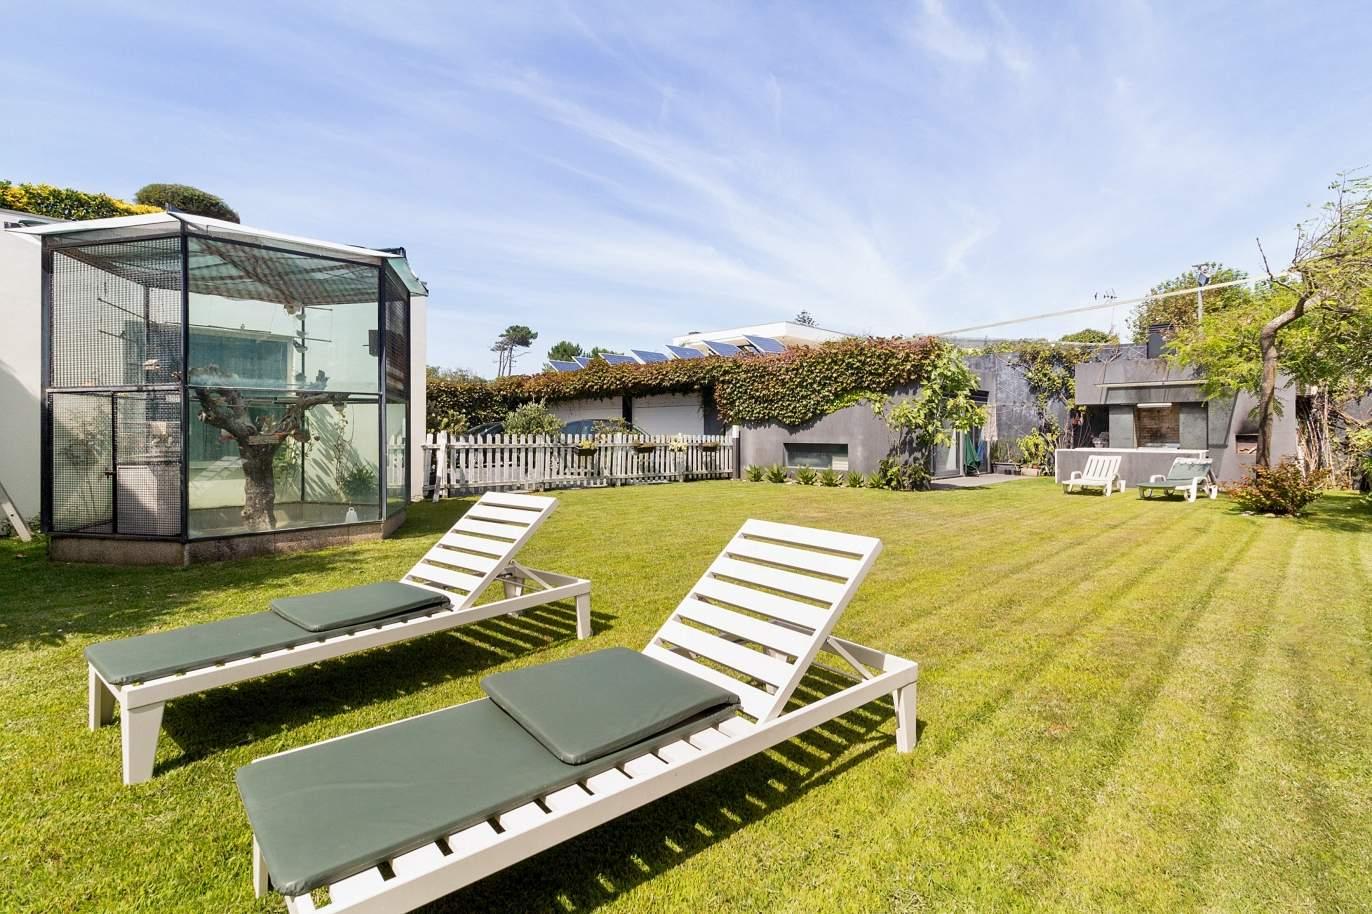 villa-for-sale-with-pool-near-the-beach-valadares-v-n-gaia-portugal